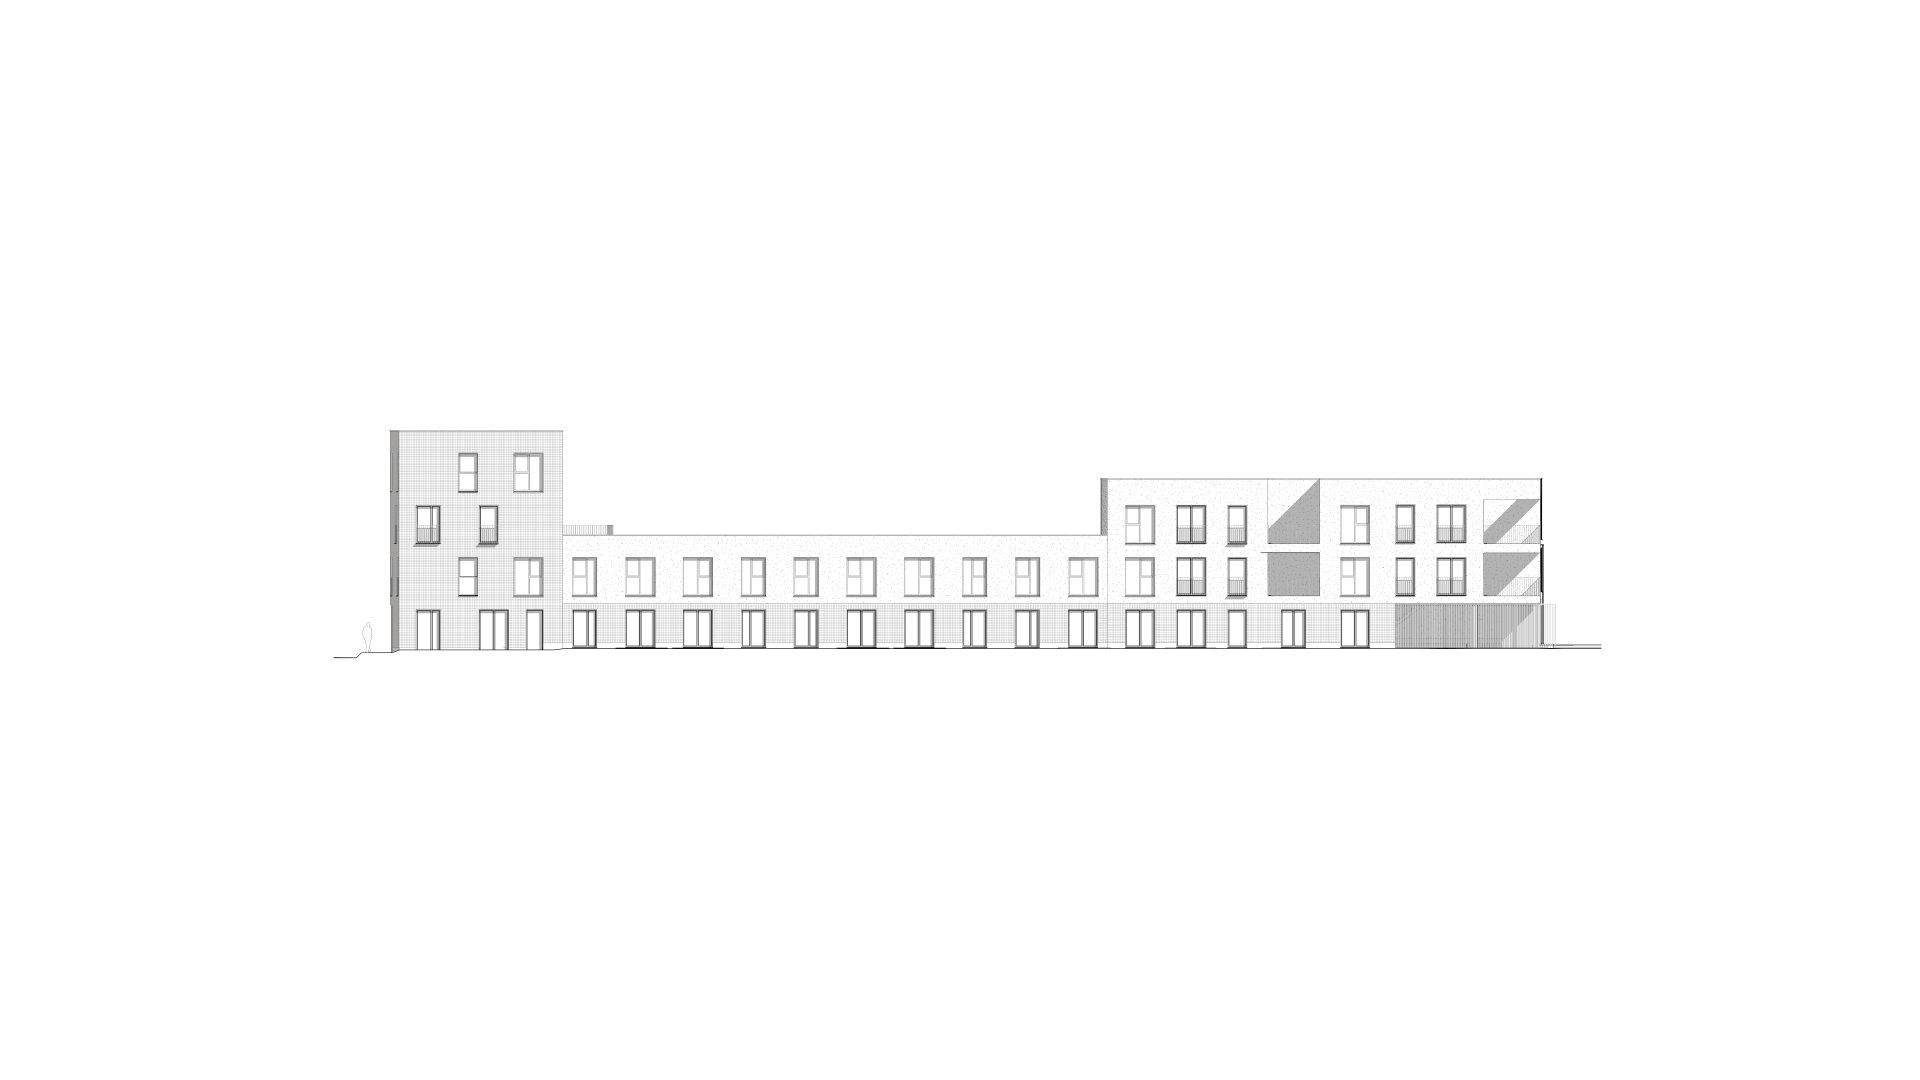 Rauter, collectieve woningen, Anderlecht-508166583